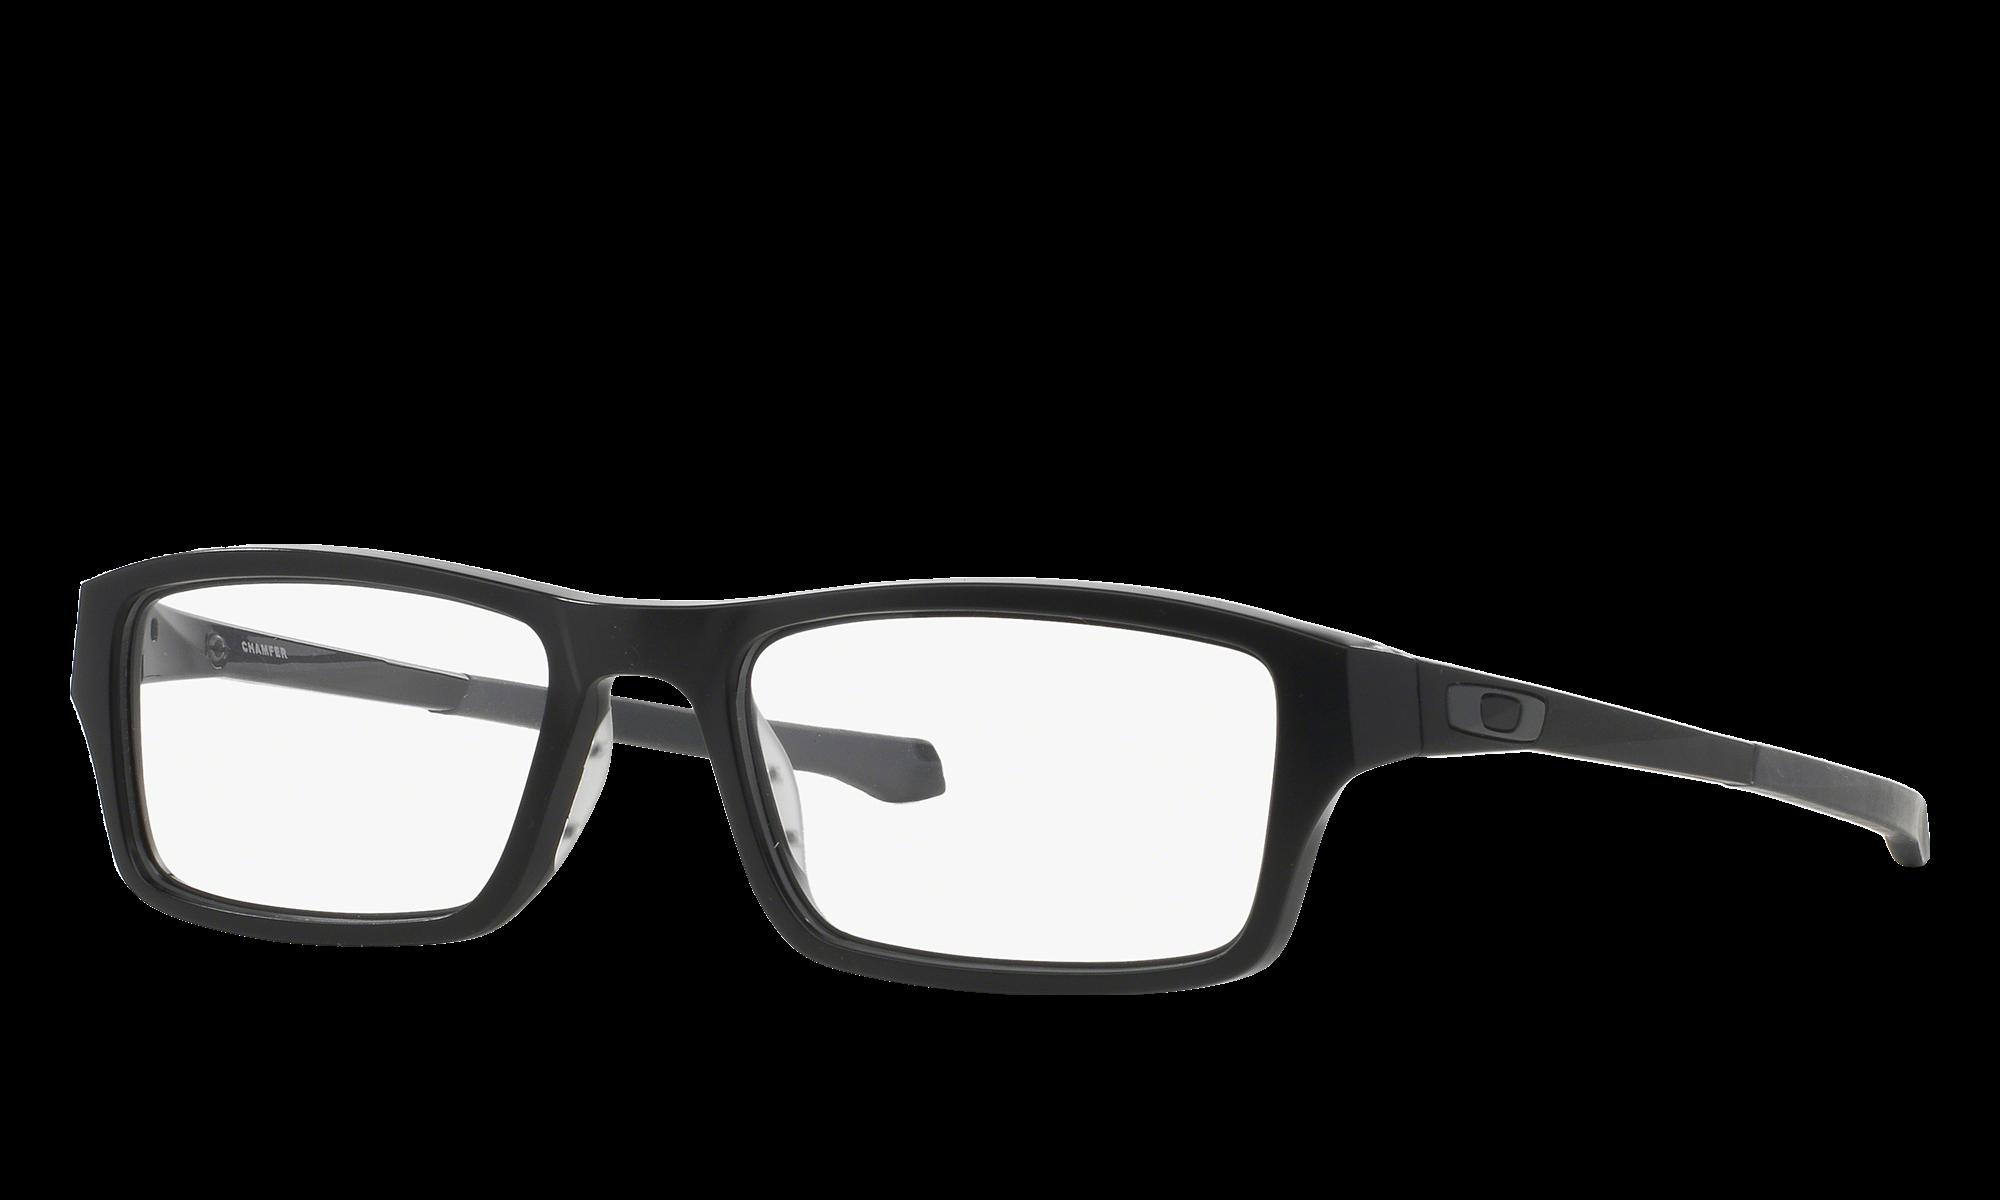 Oakley CHAMFER Black Eyeglasses | Glasses.com® | Free Shipping